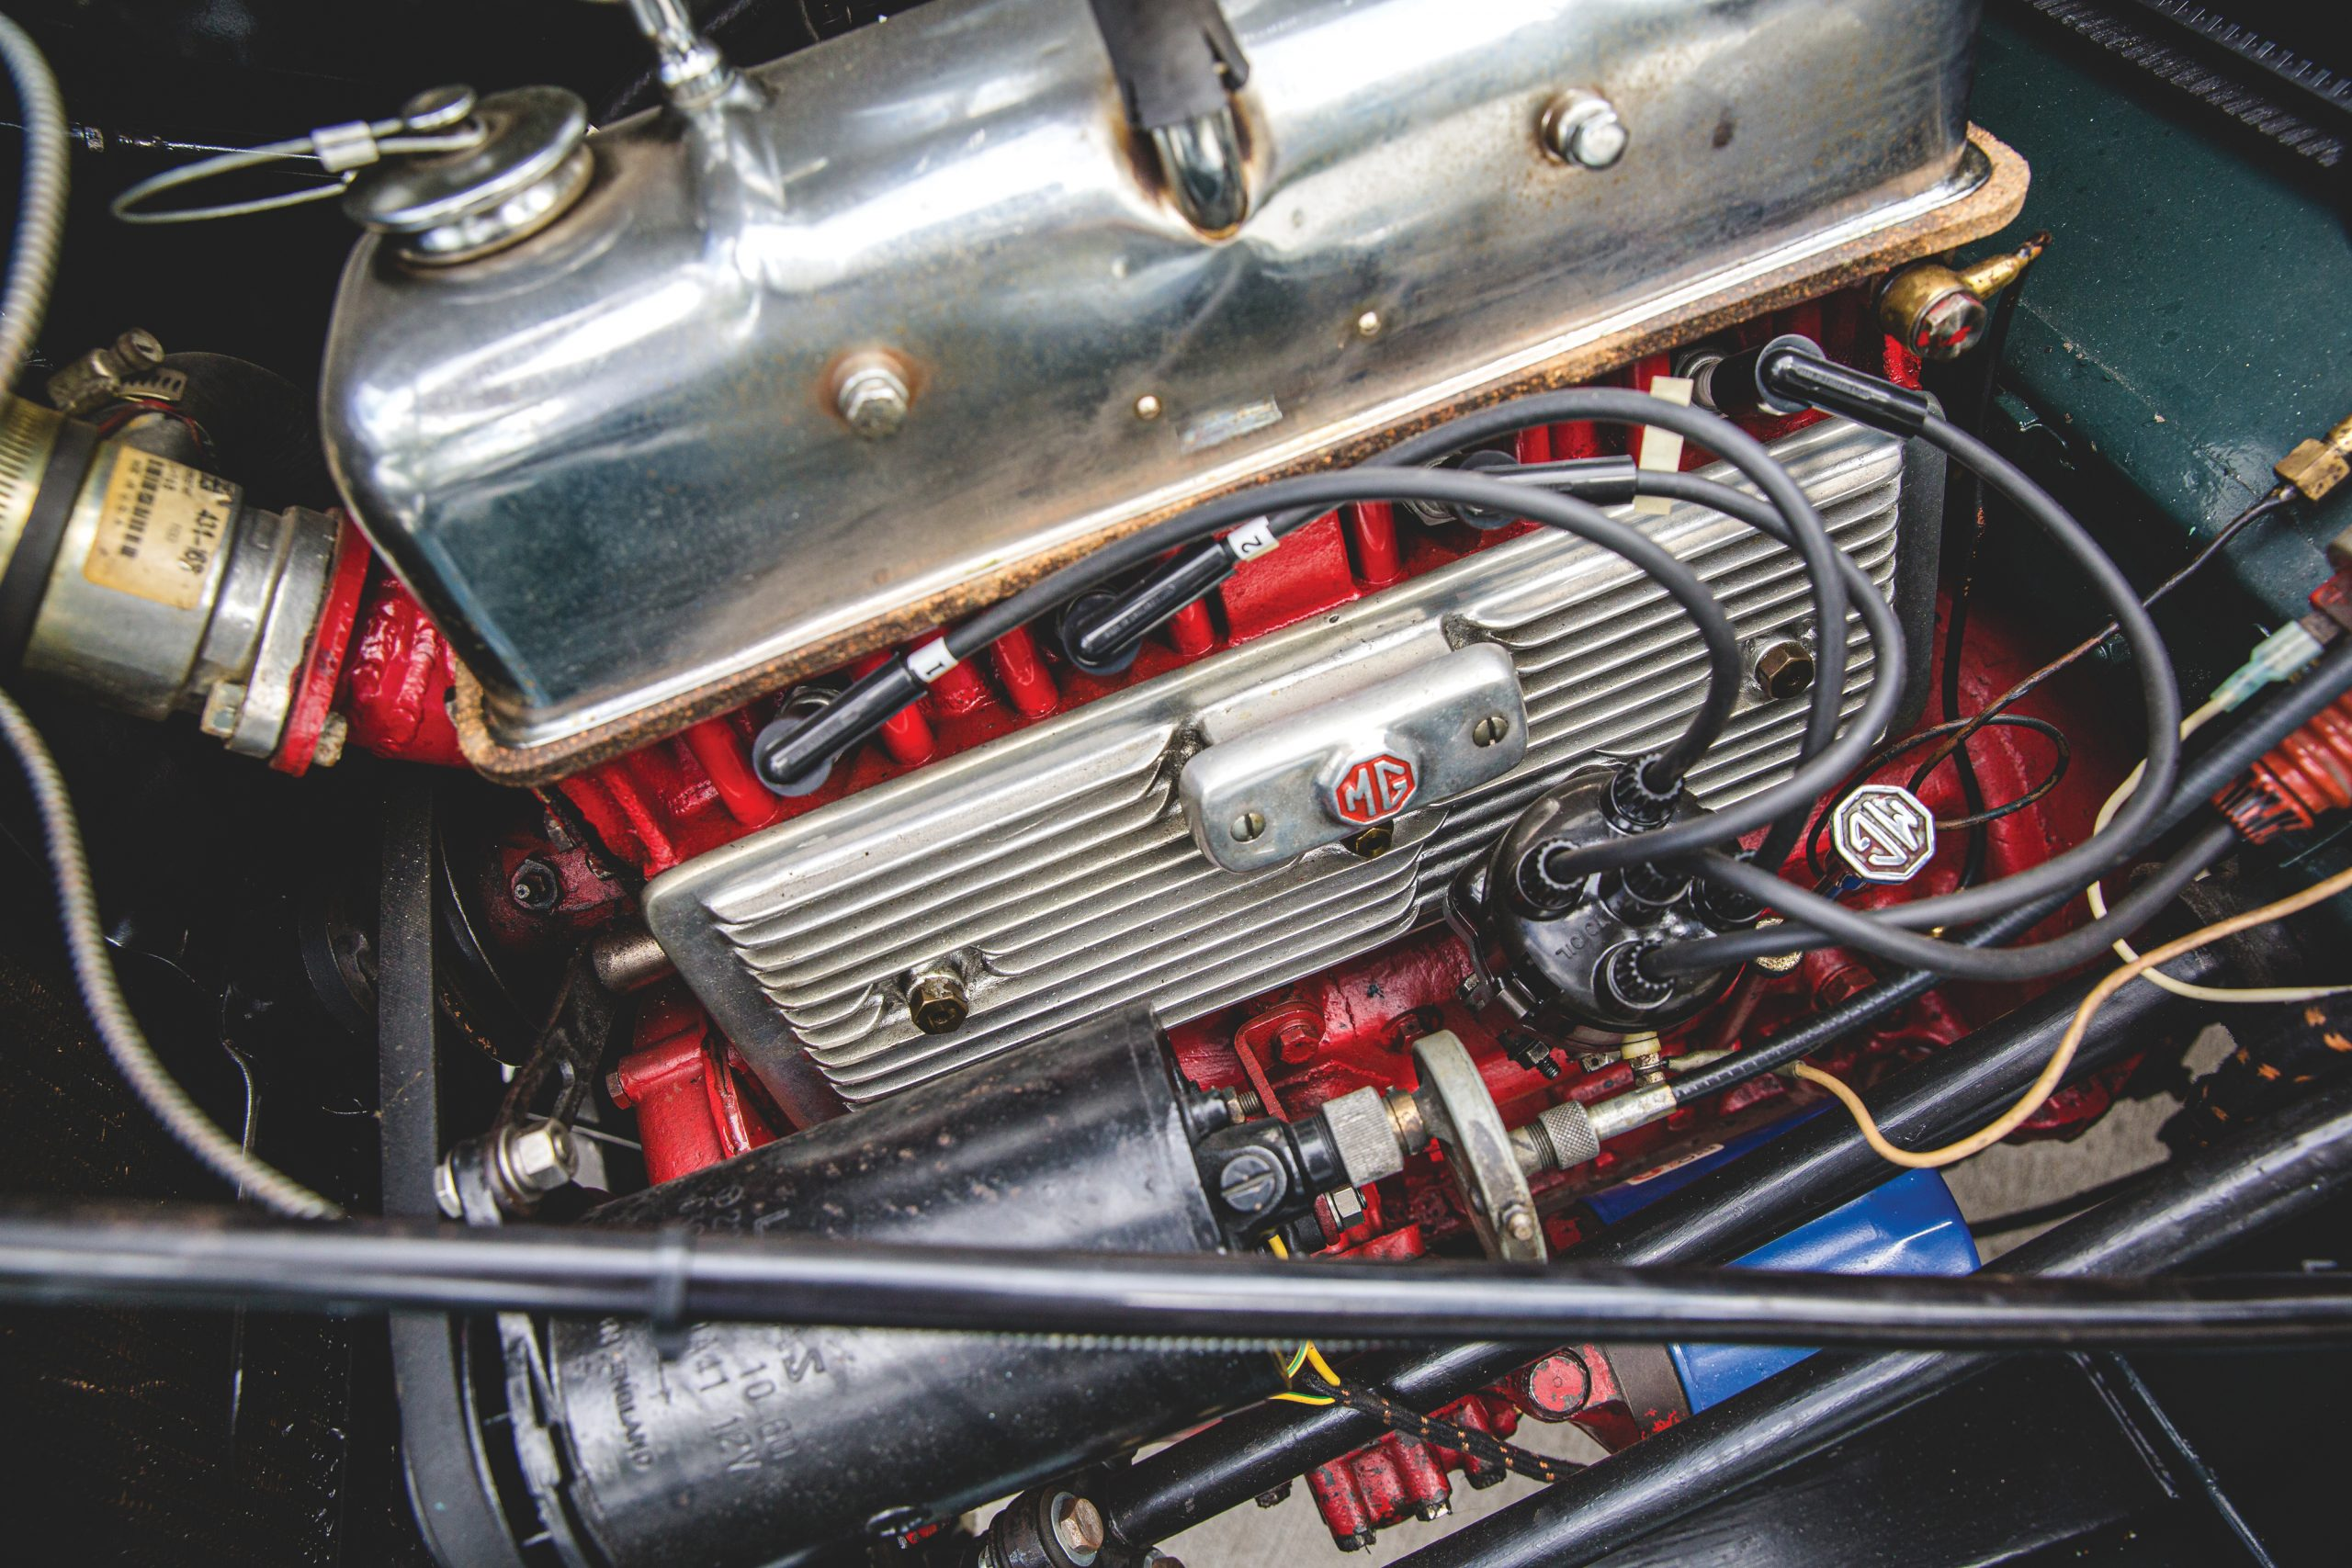 1952 MG TD engine